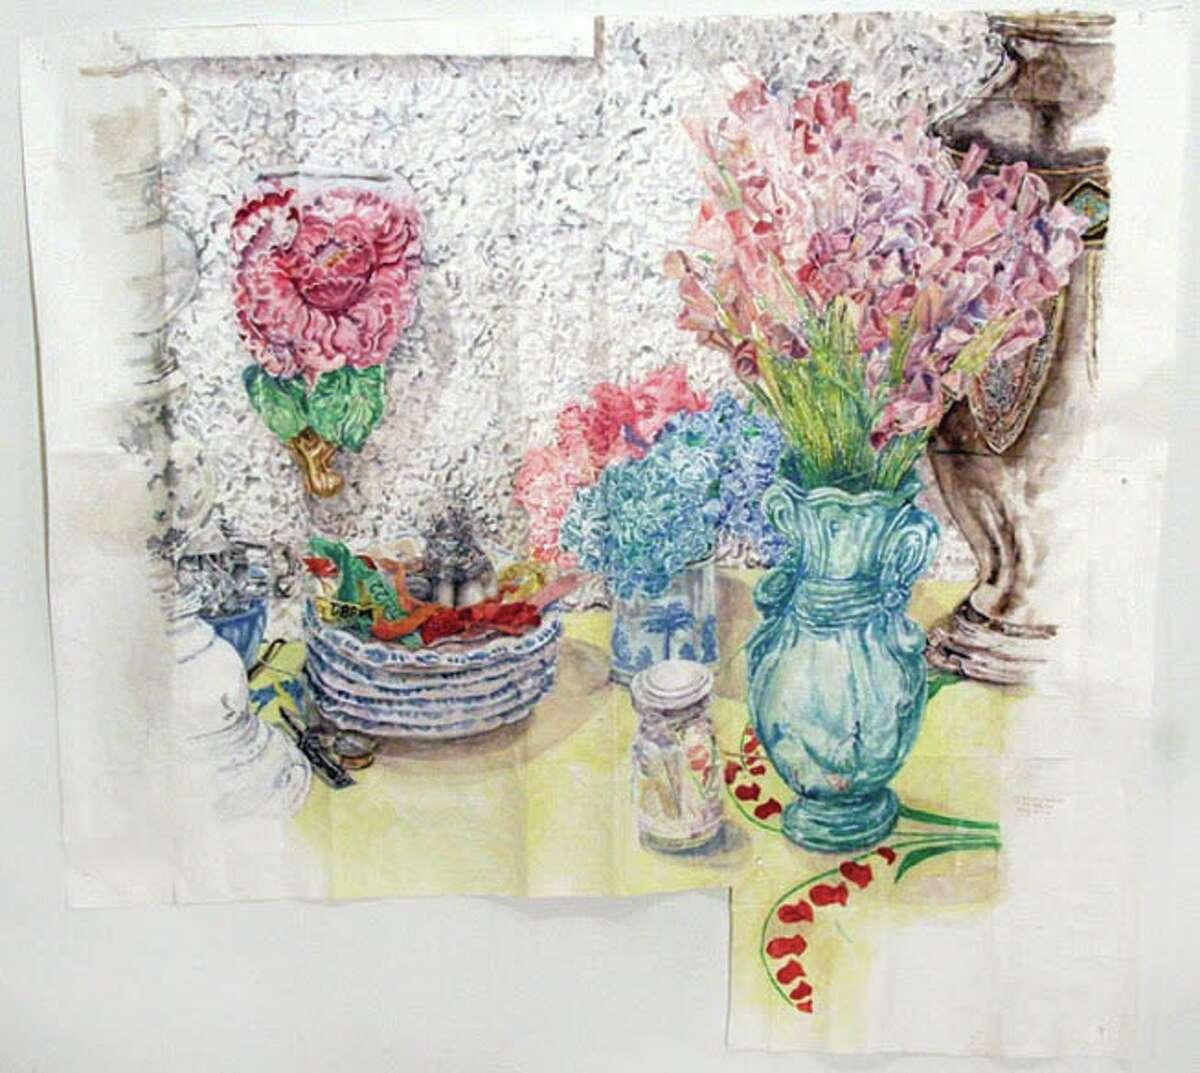 Paper Flowers, 2014, watercolor on paper (Courtesy John Davis Gallery)